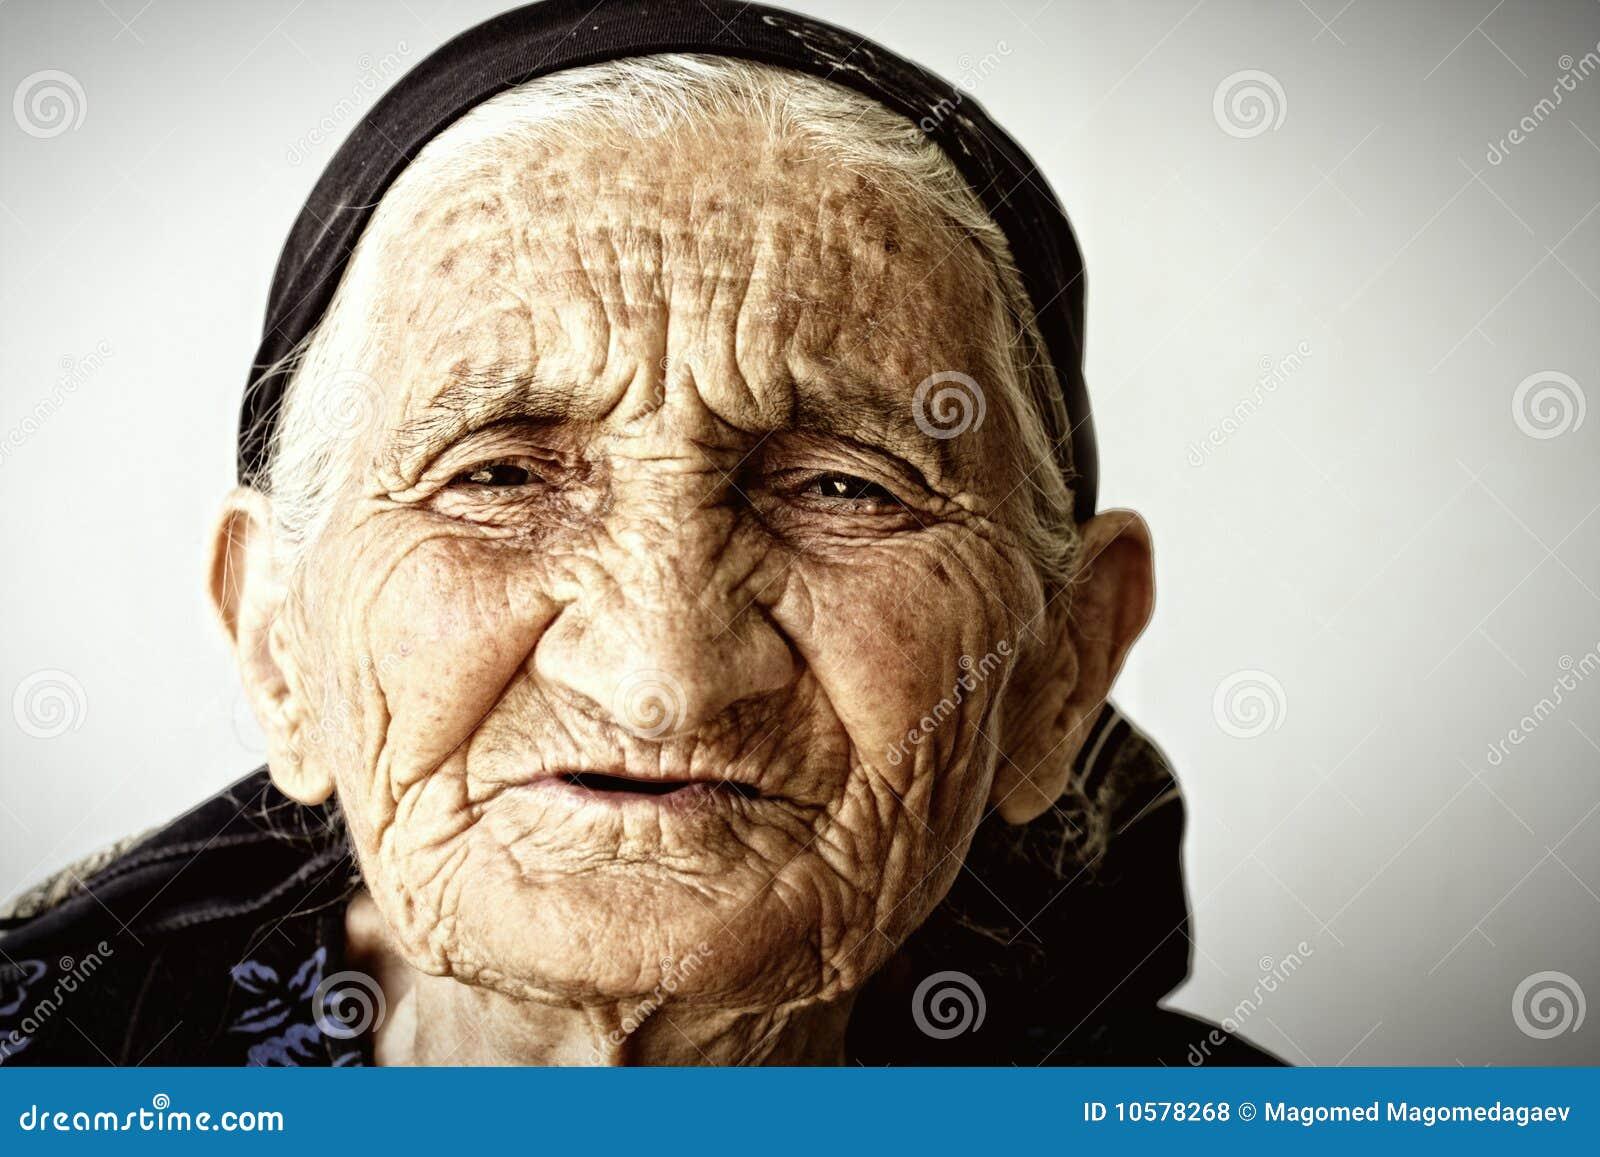 Zeer oud vrouwengezicht